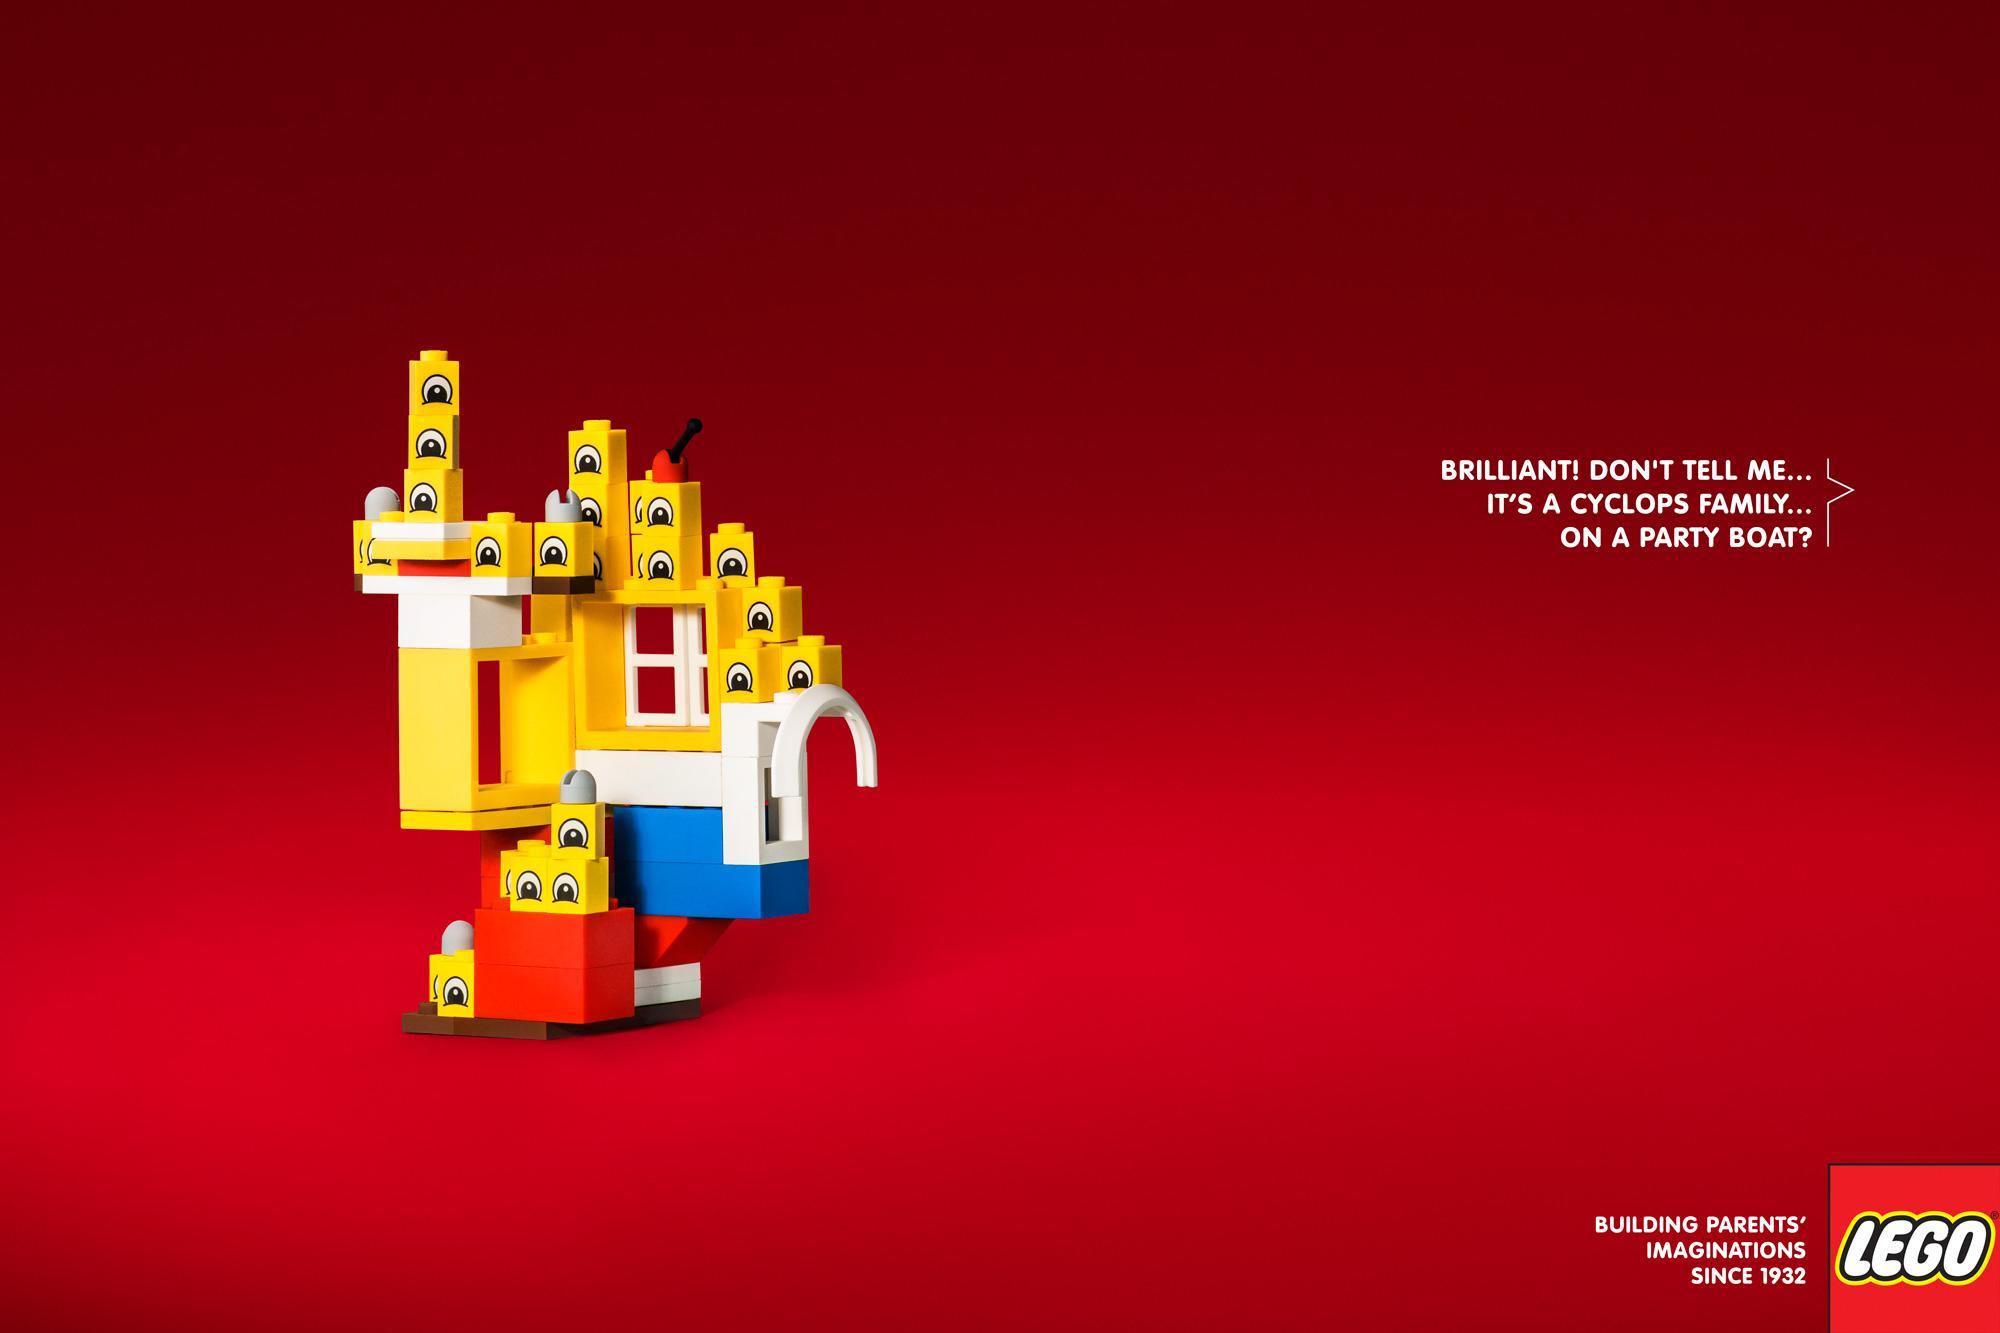 Lego Print Ad - Cyclops Family